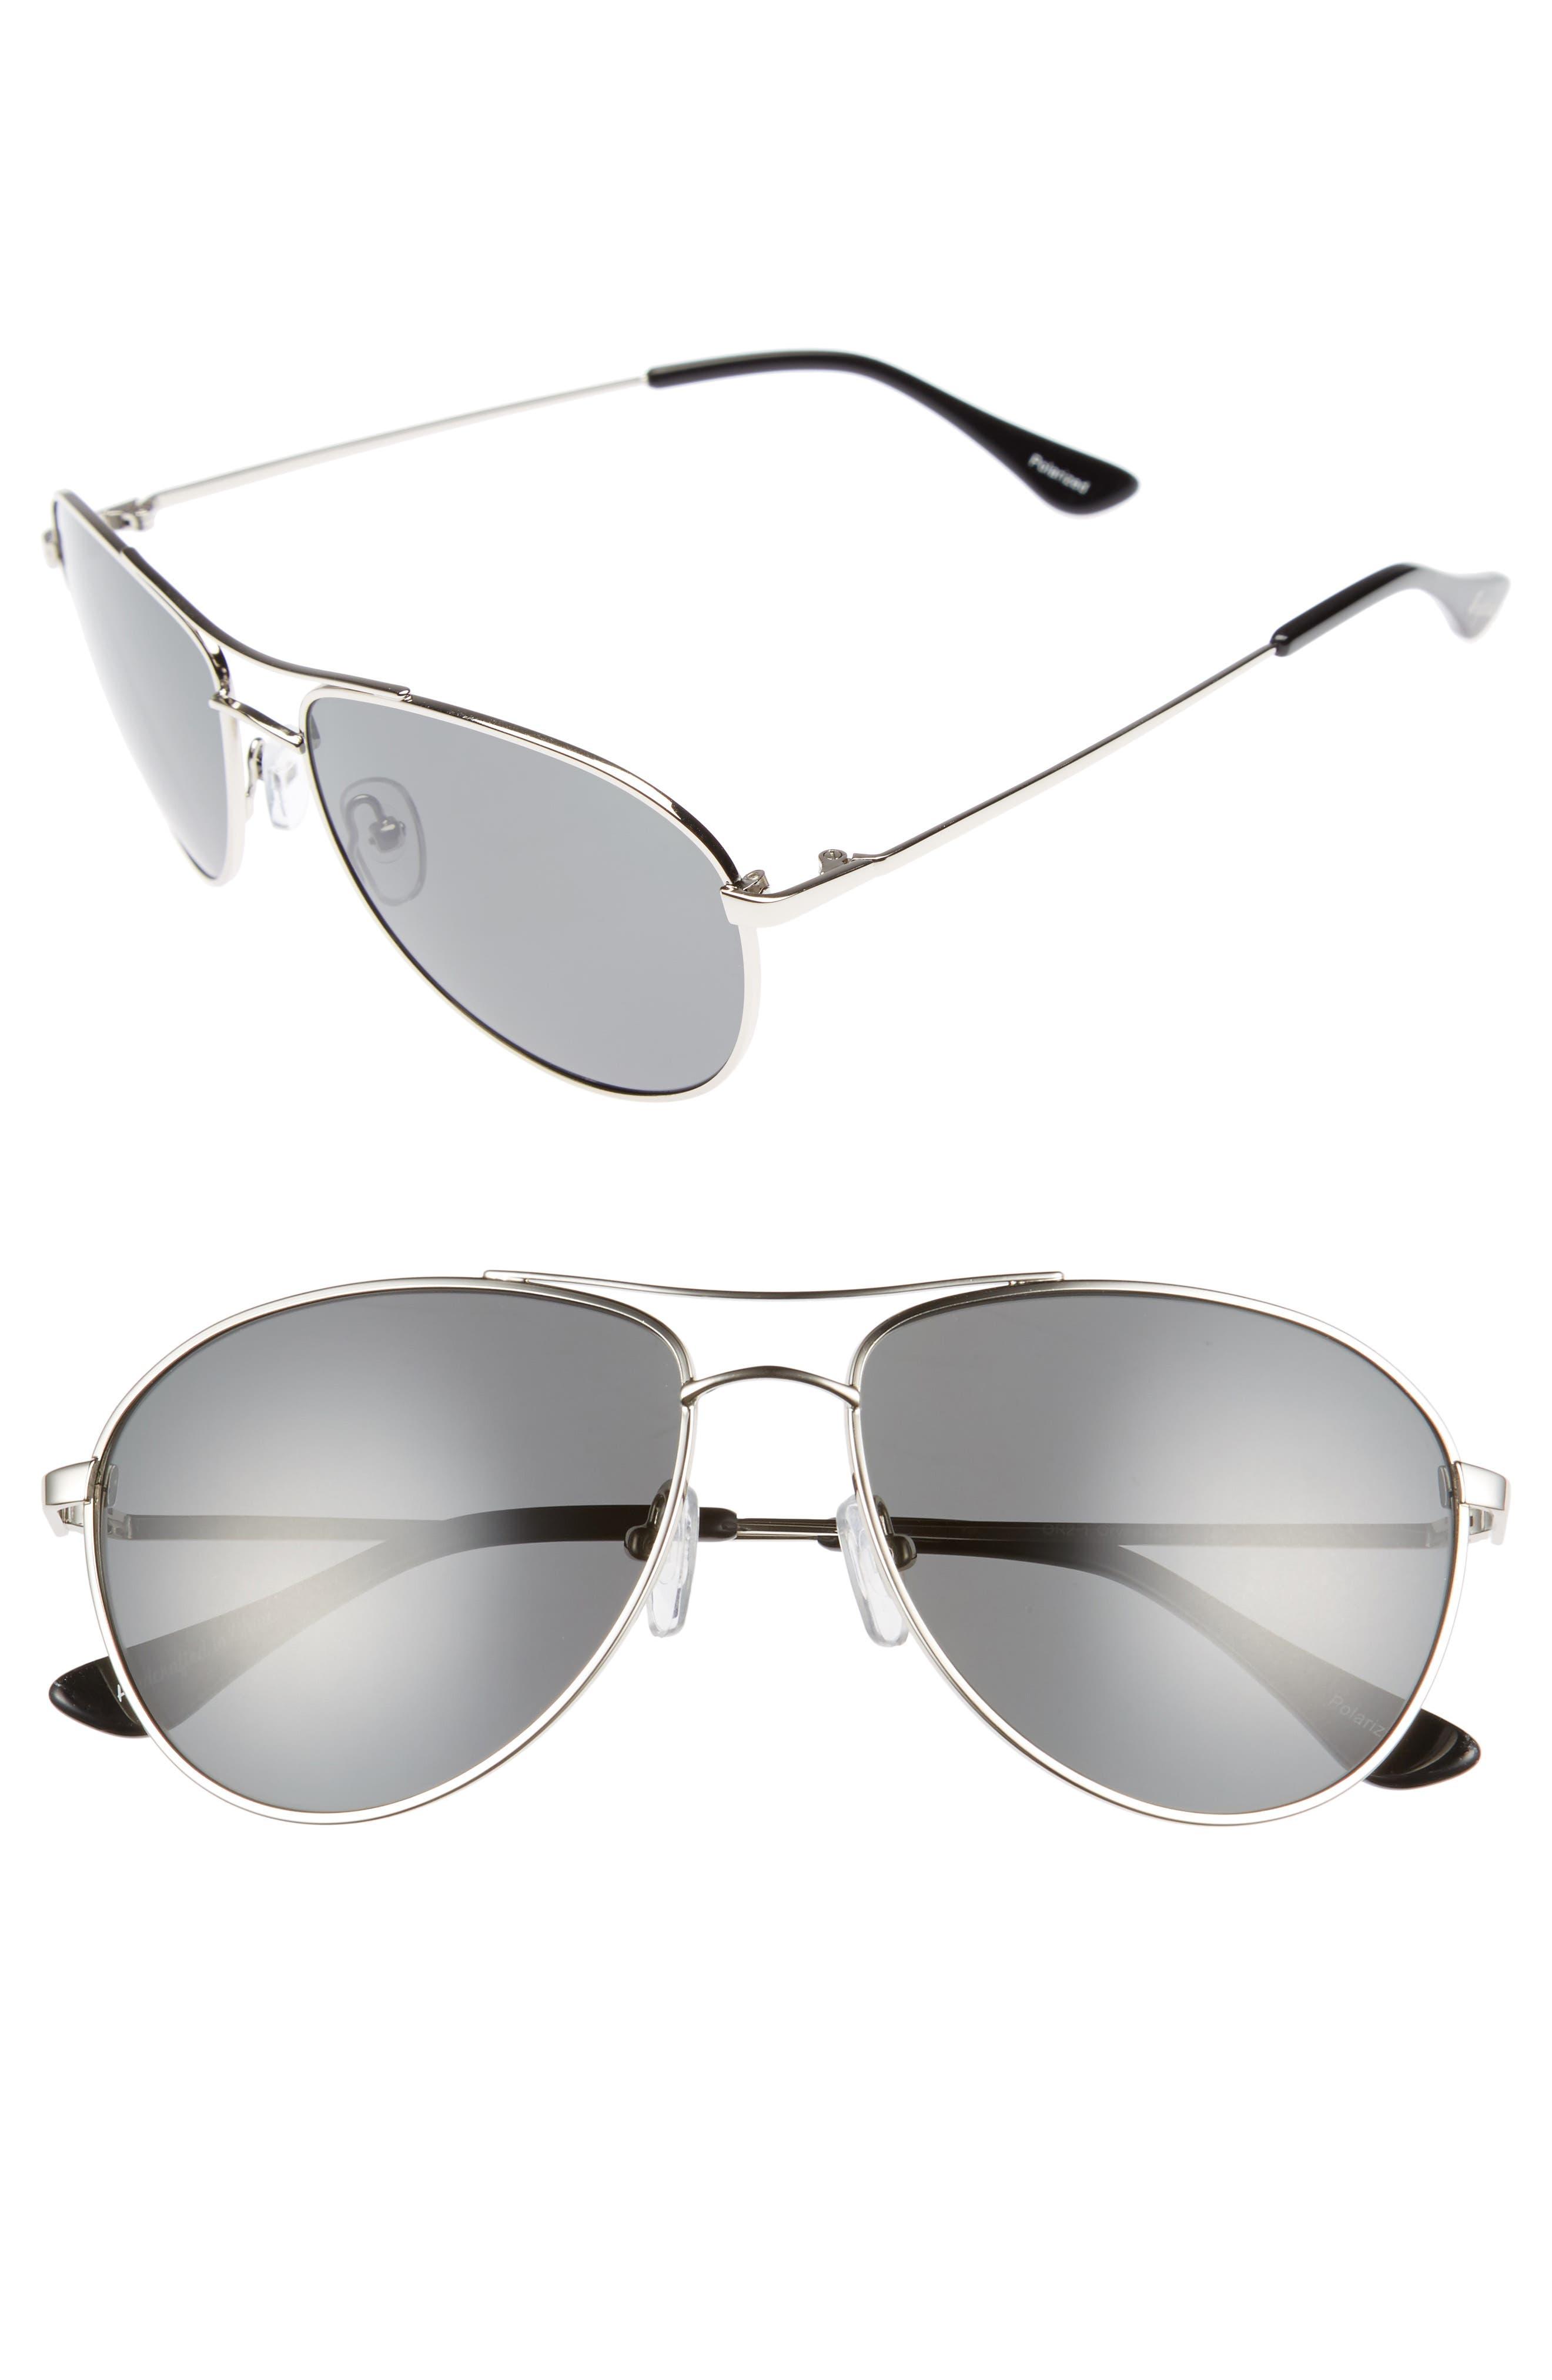 Orville 58mm Polarized Aviator Sunglasses,                             Main thumbnail 1, color,